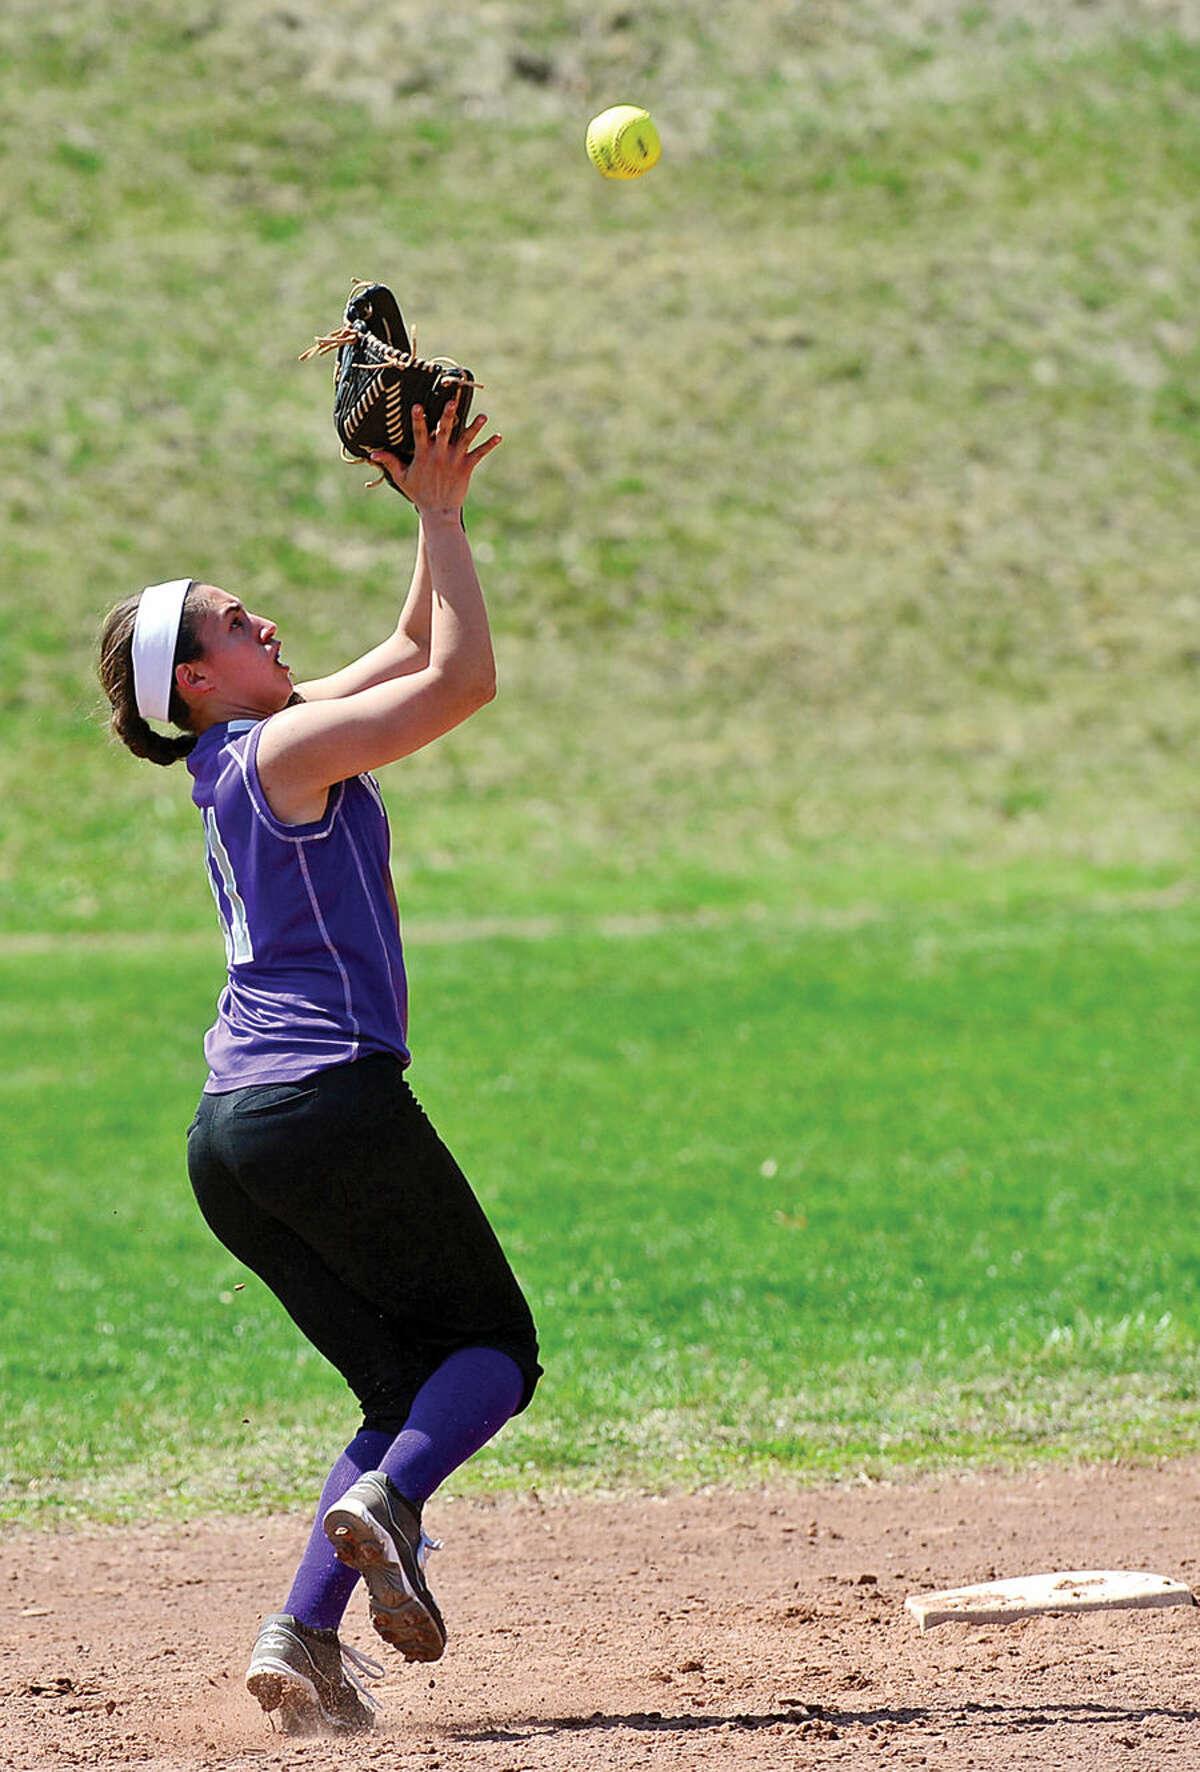 Hour photo / Erik Trautmann Westhill's #11 Gabby Laccola tracks down a fly ball during their softball game against Stamford High School Saturday.